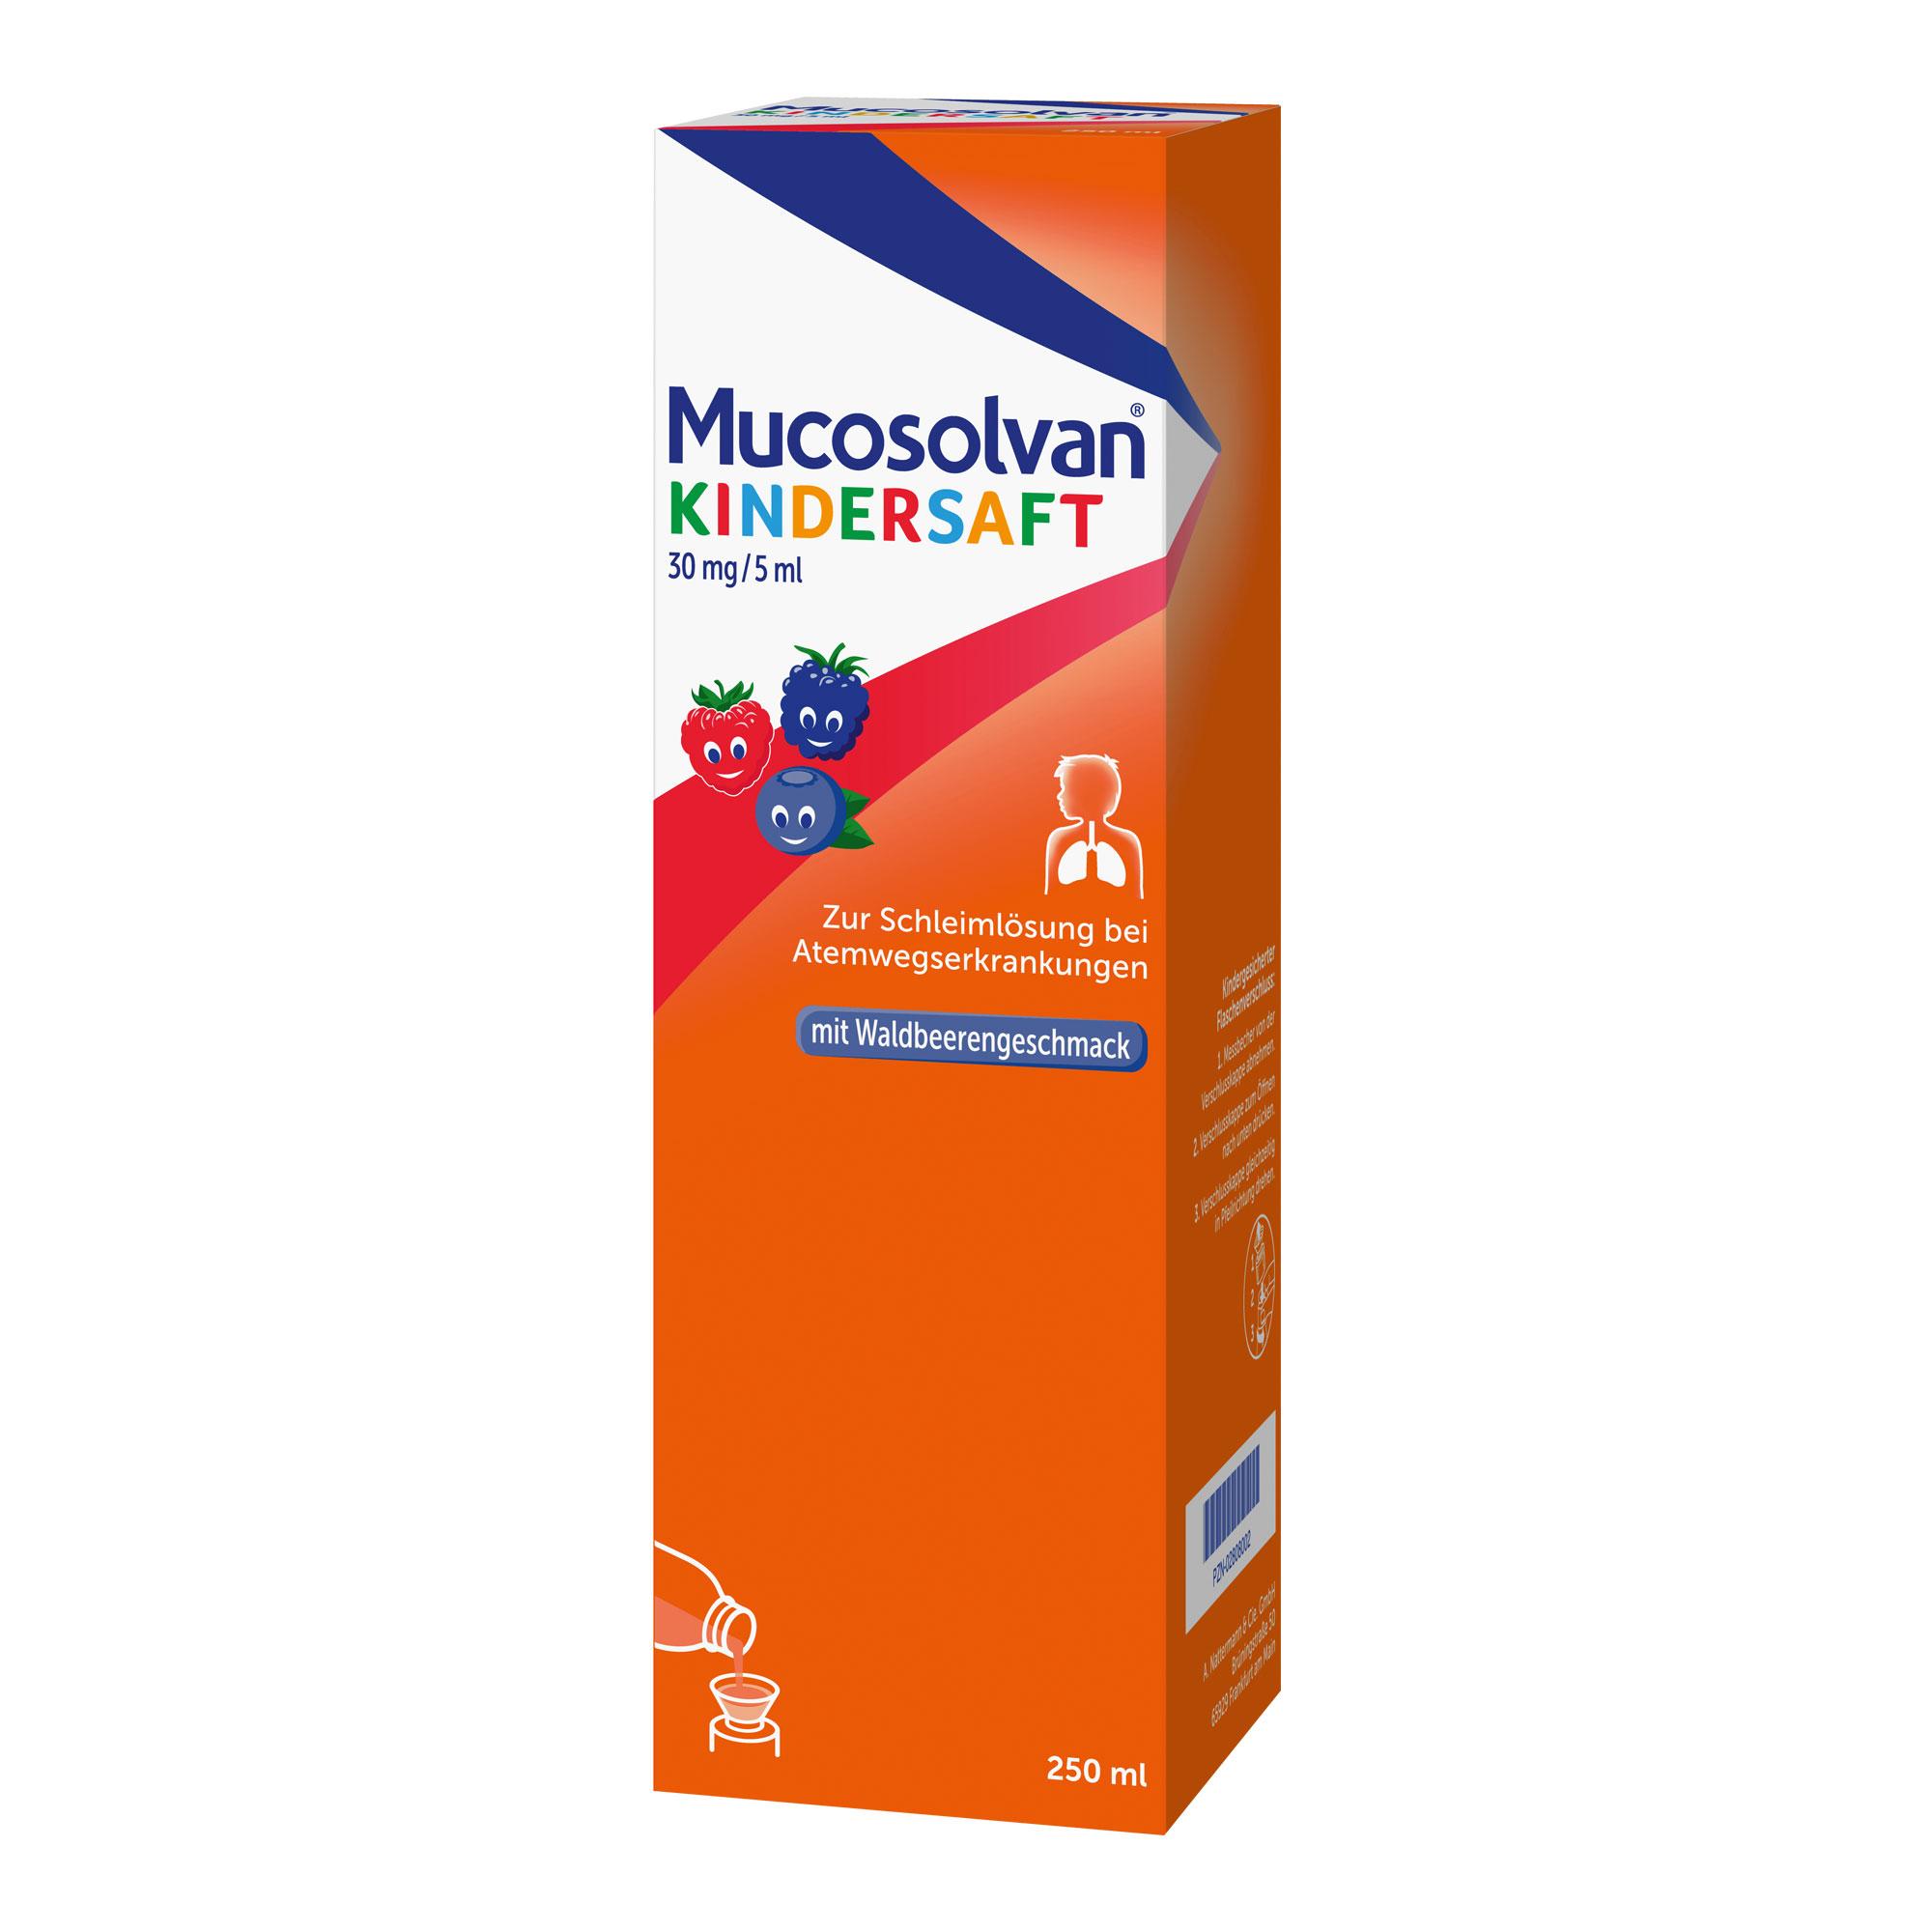 Mucosolvan Kindersaft 30 mg/ 5 ml